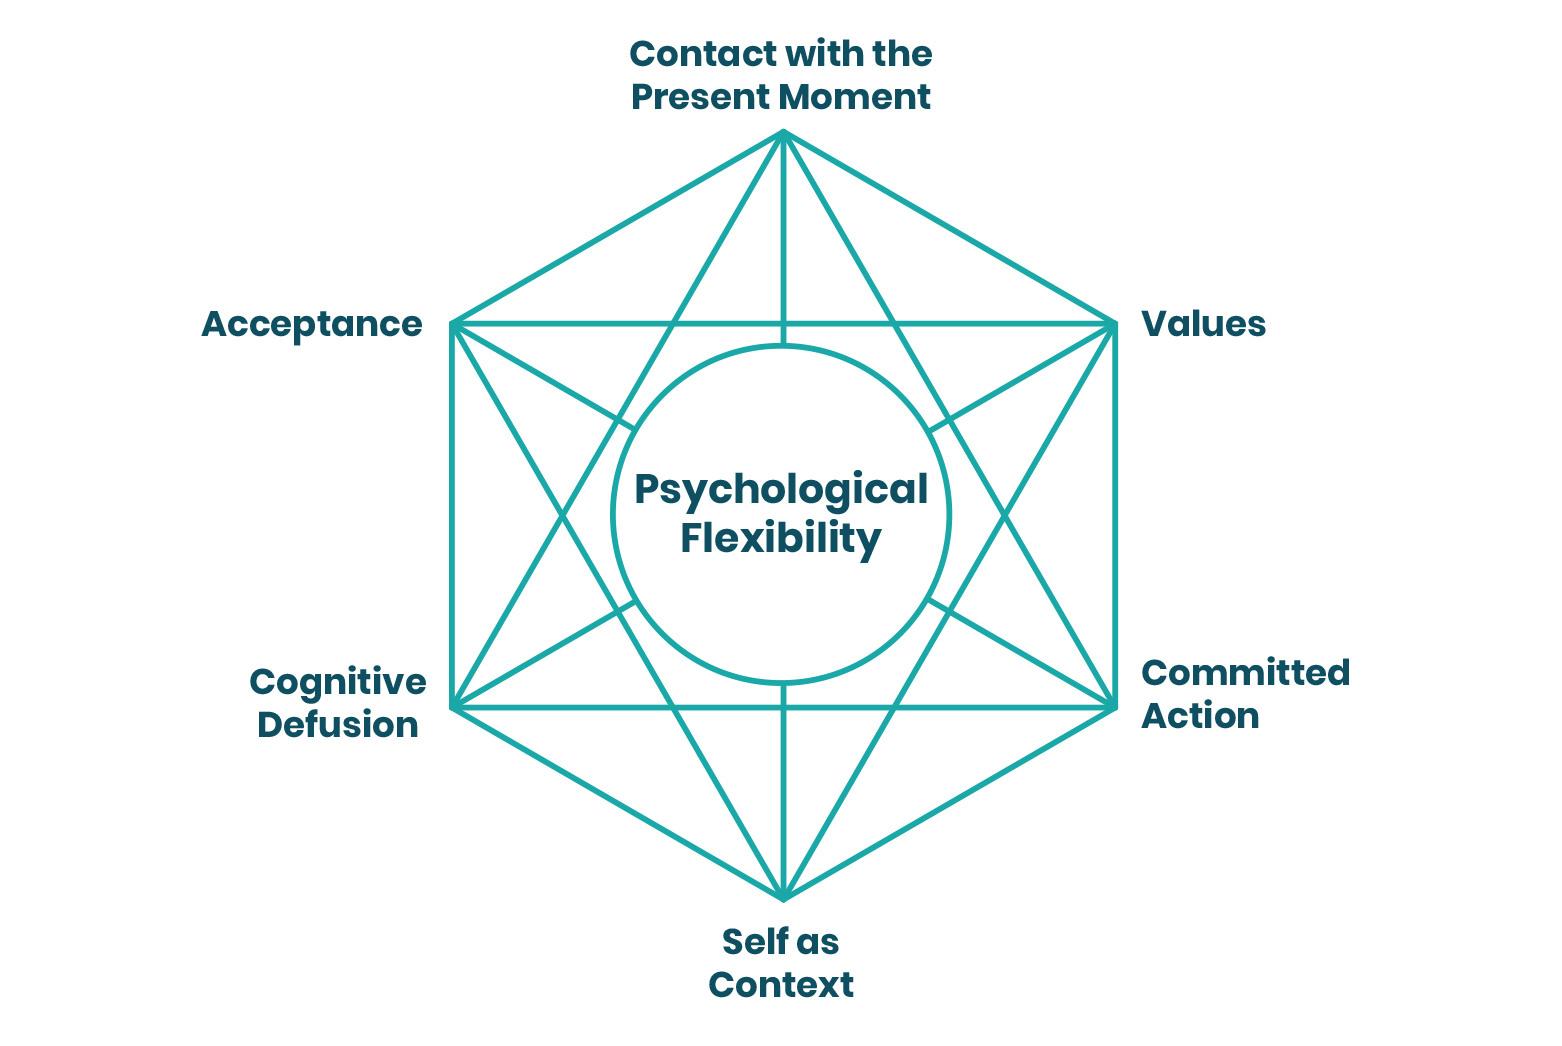 10_ACT_Psychological Flexibility graphics@2x